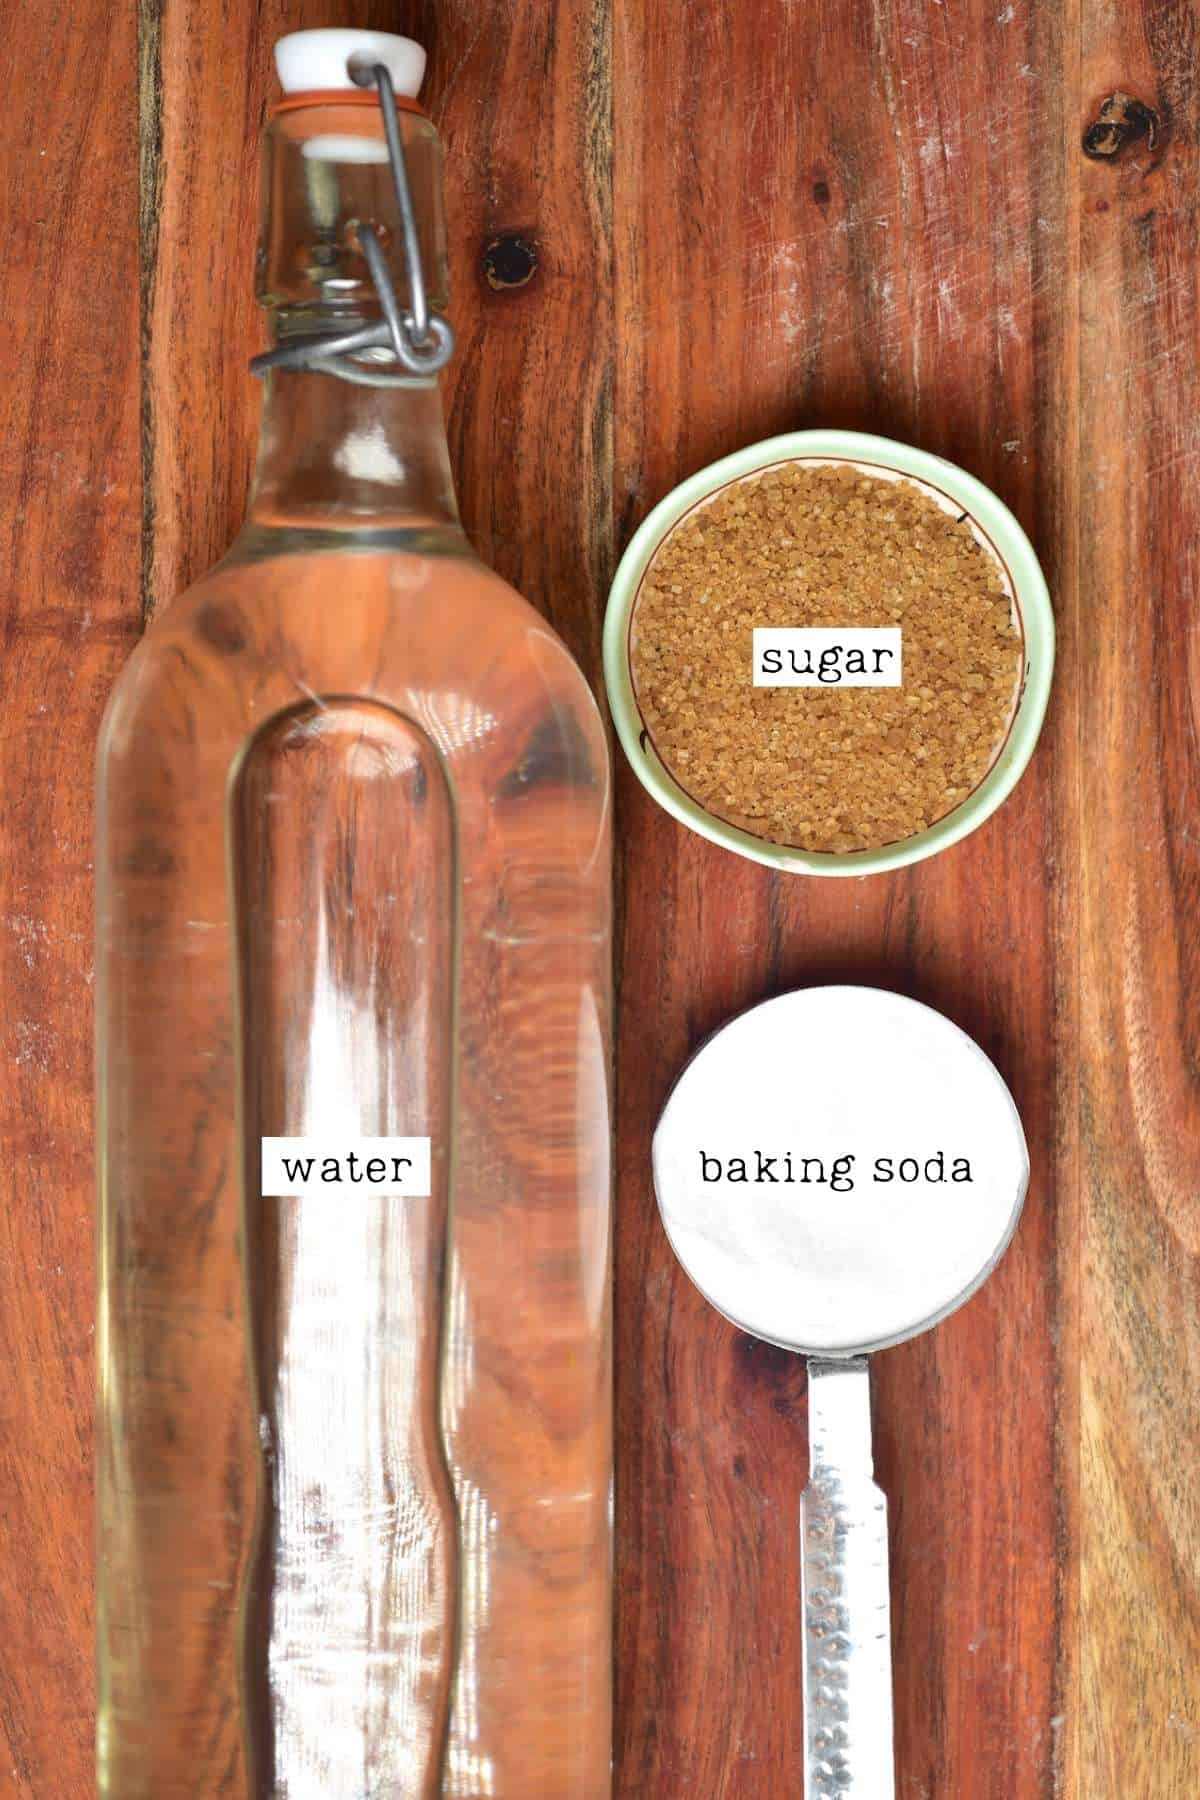 Ingredients for poaching bath